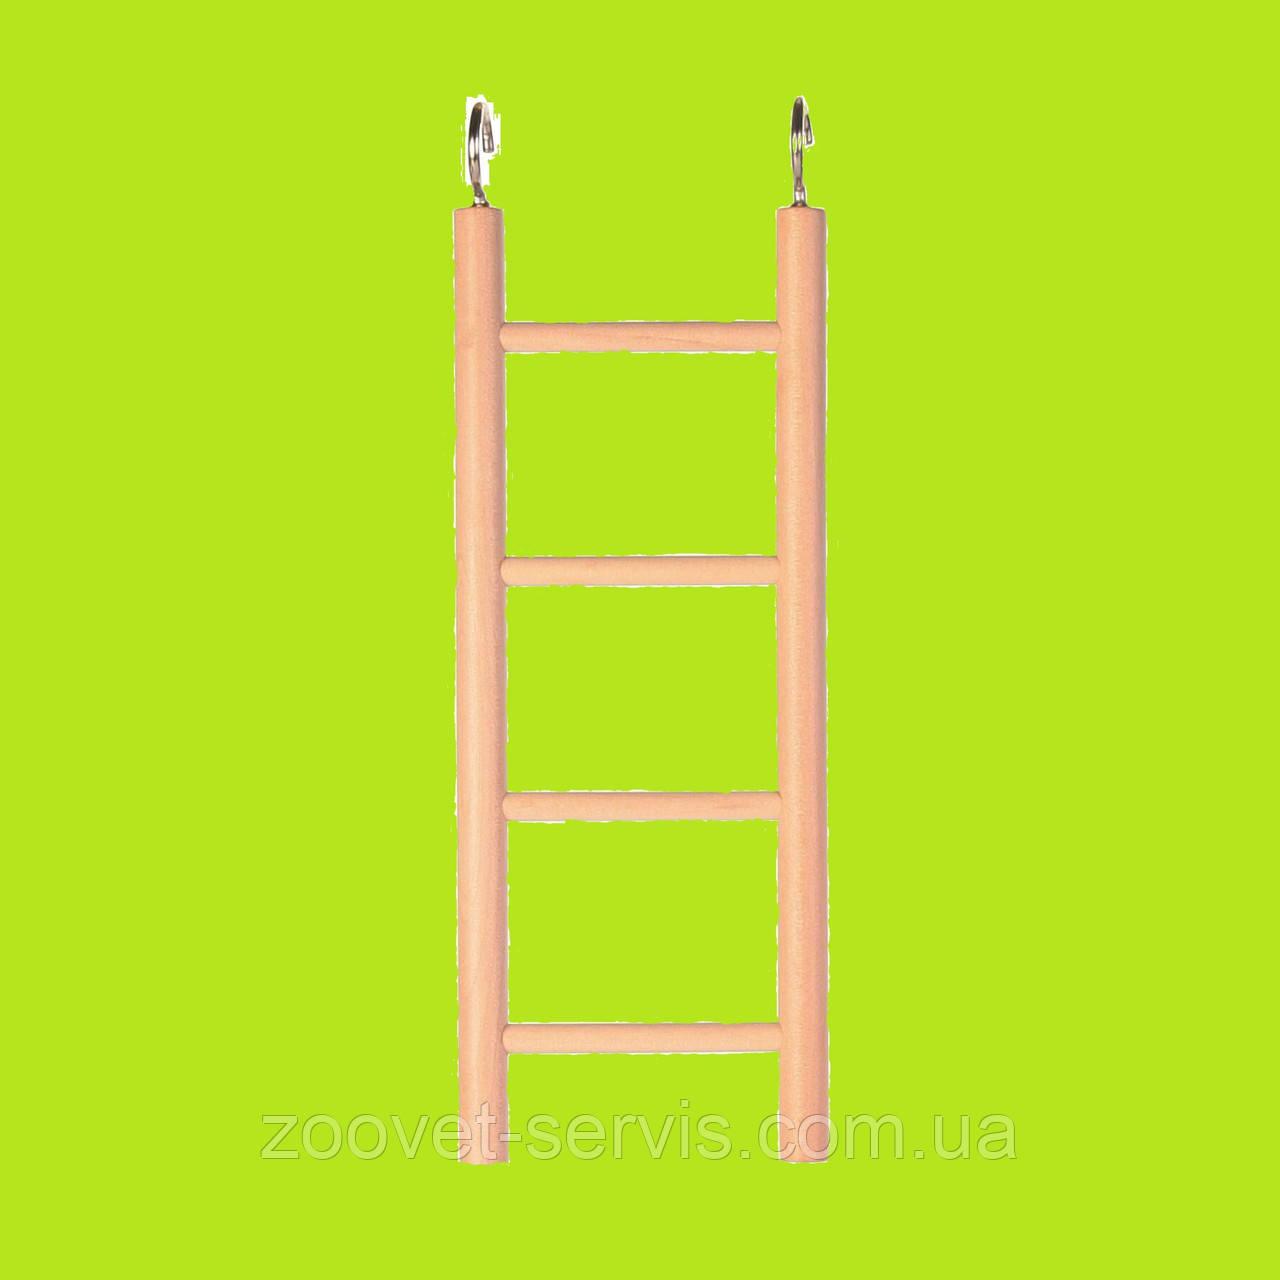 Лестница для попугая TRIXIE Размер: 20см